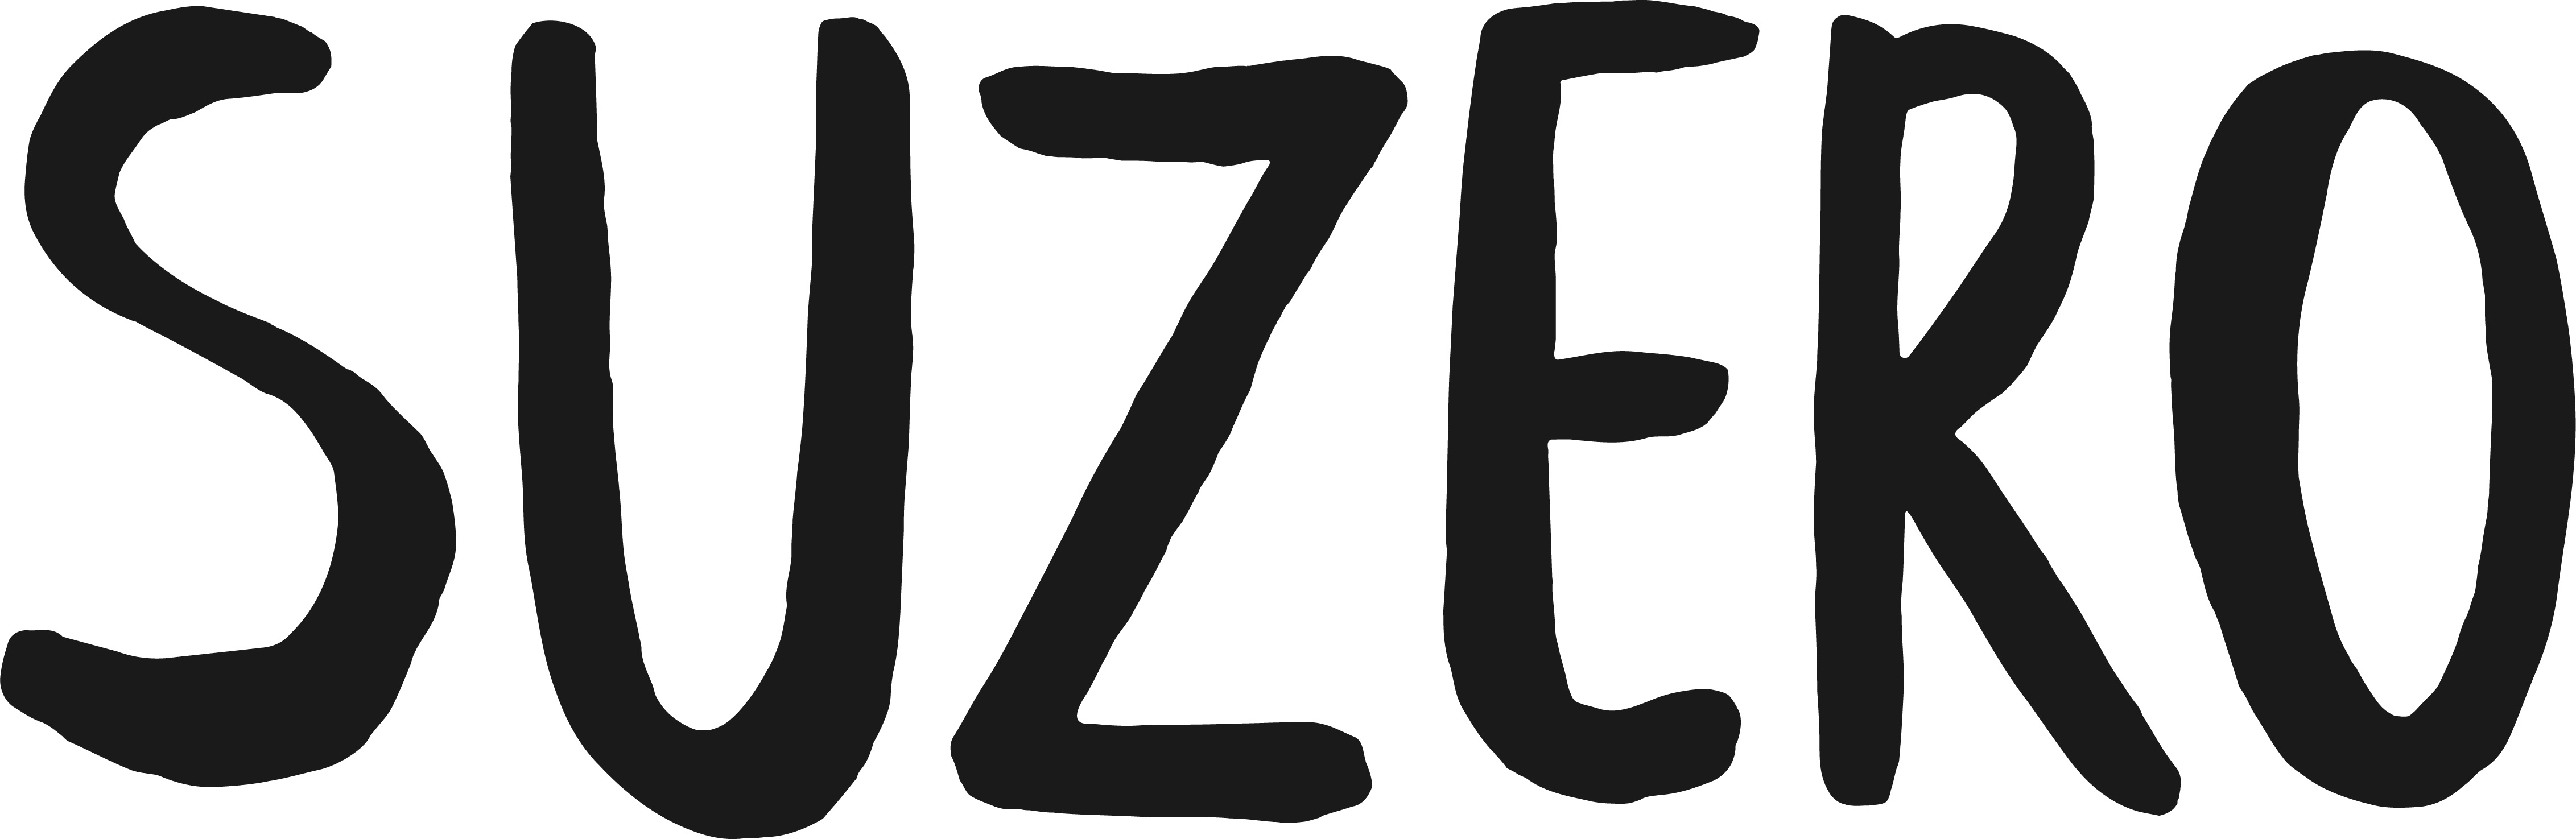 Suzero logo